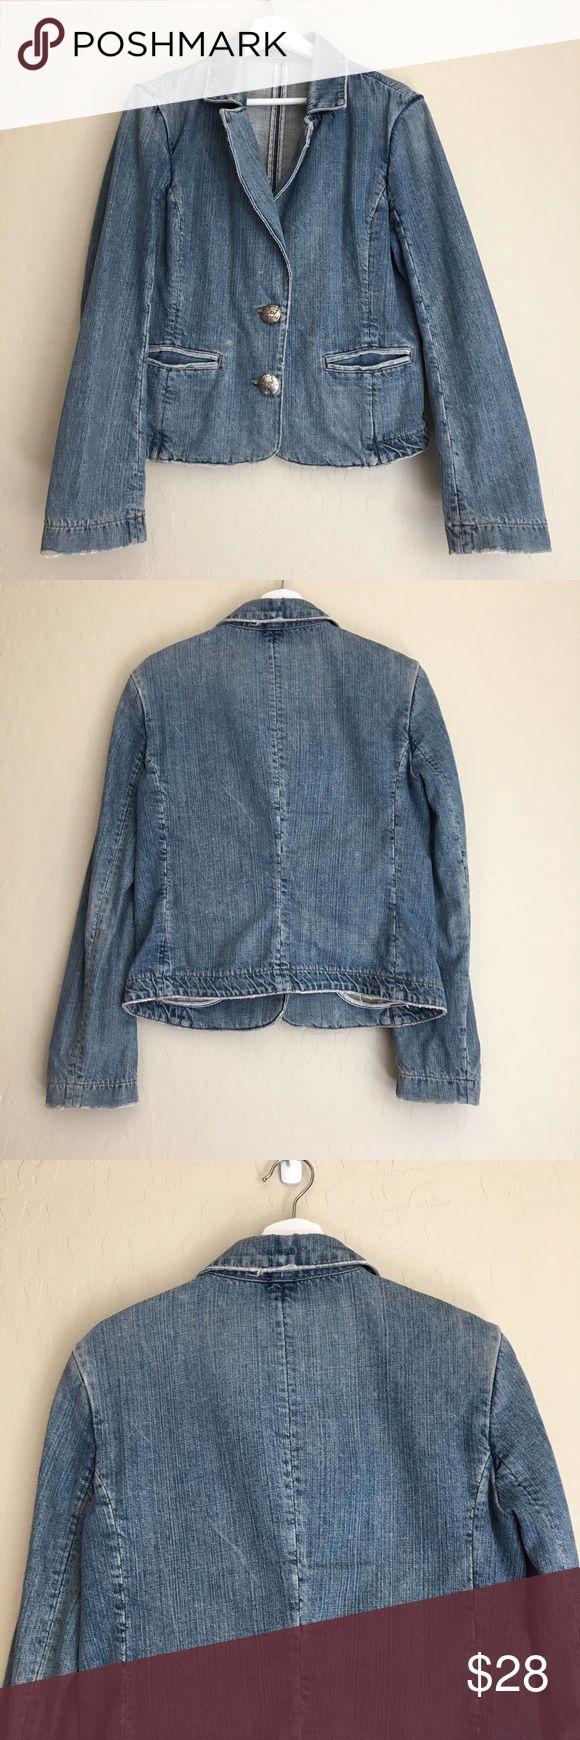 Paige Wilshire Blvd Denim Blazer Versatile denim blazer by premium brand Paige. Features two button closure and double front pockets. Good preloved condition. Paige Jeans Jackets & Coats